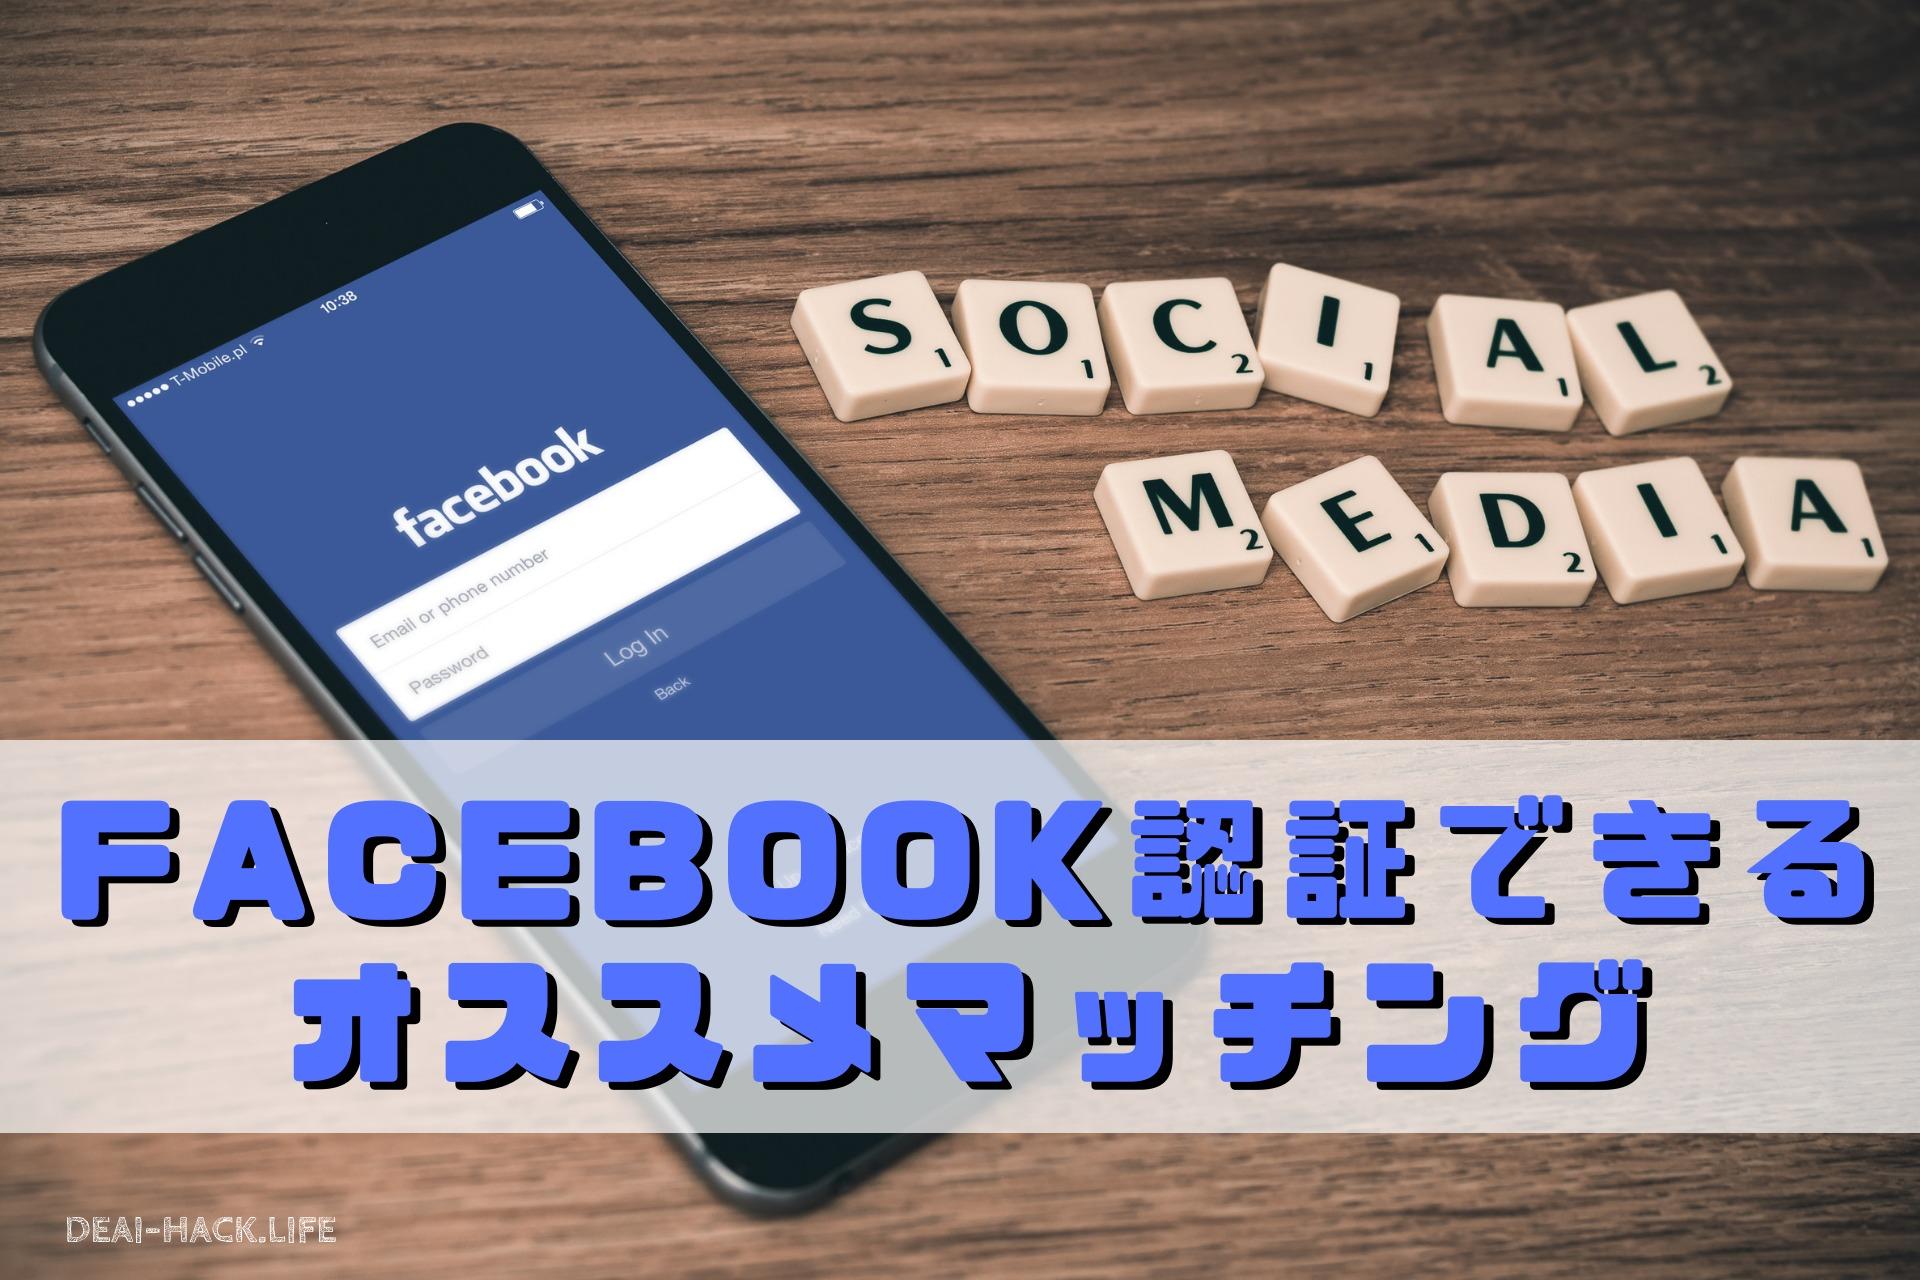 Facebook認証のマッチングアプリは安心!?Facebook認証のオススメアプリ紹介!